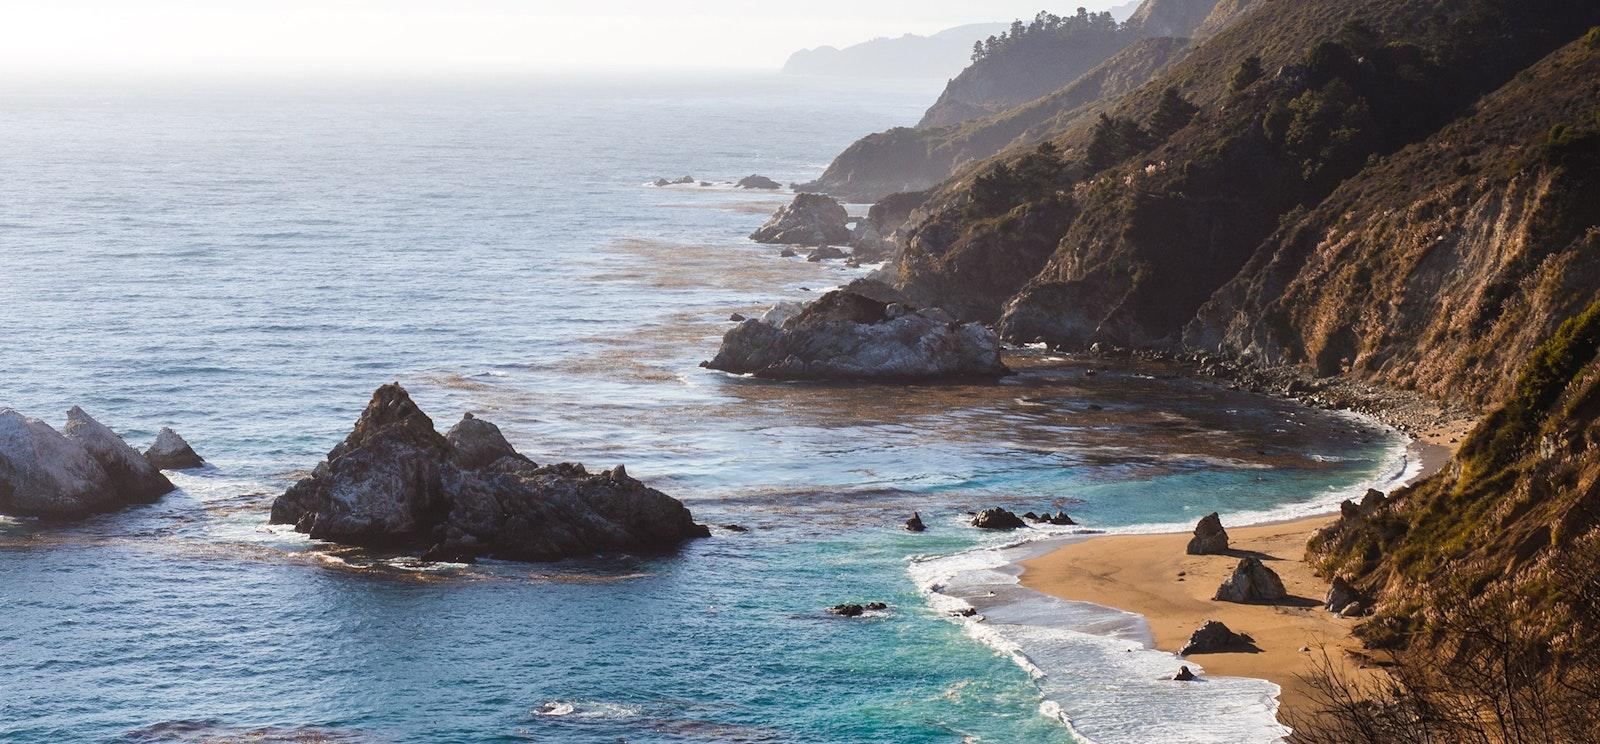 Rocky shoreline and cliffs of California